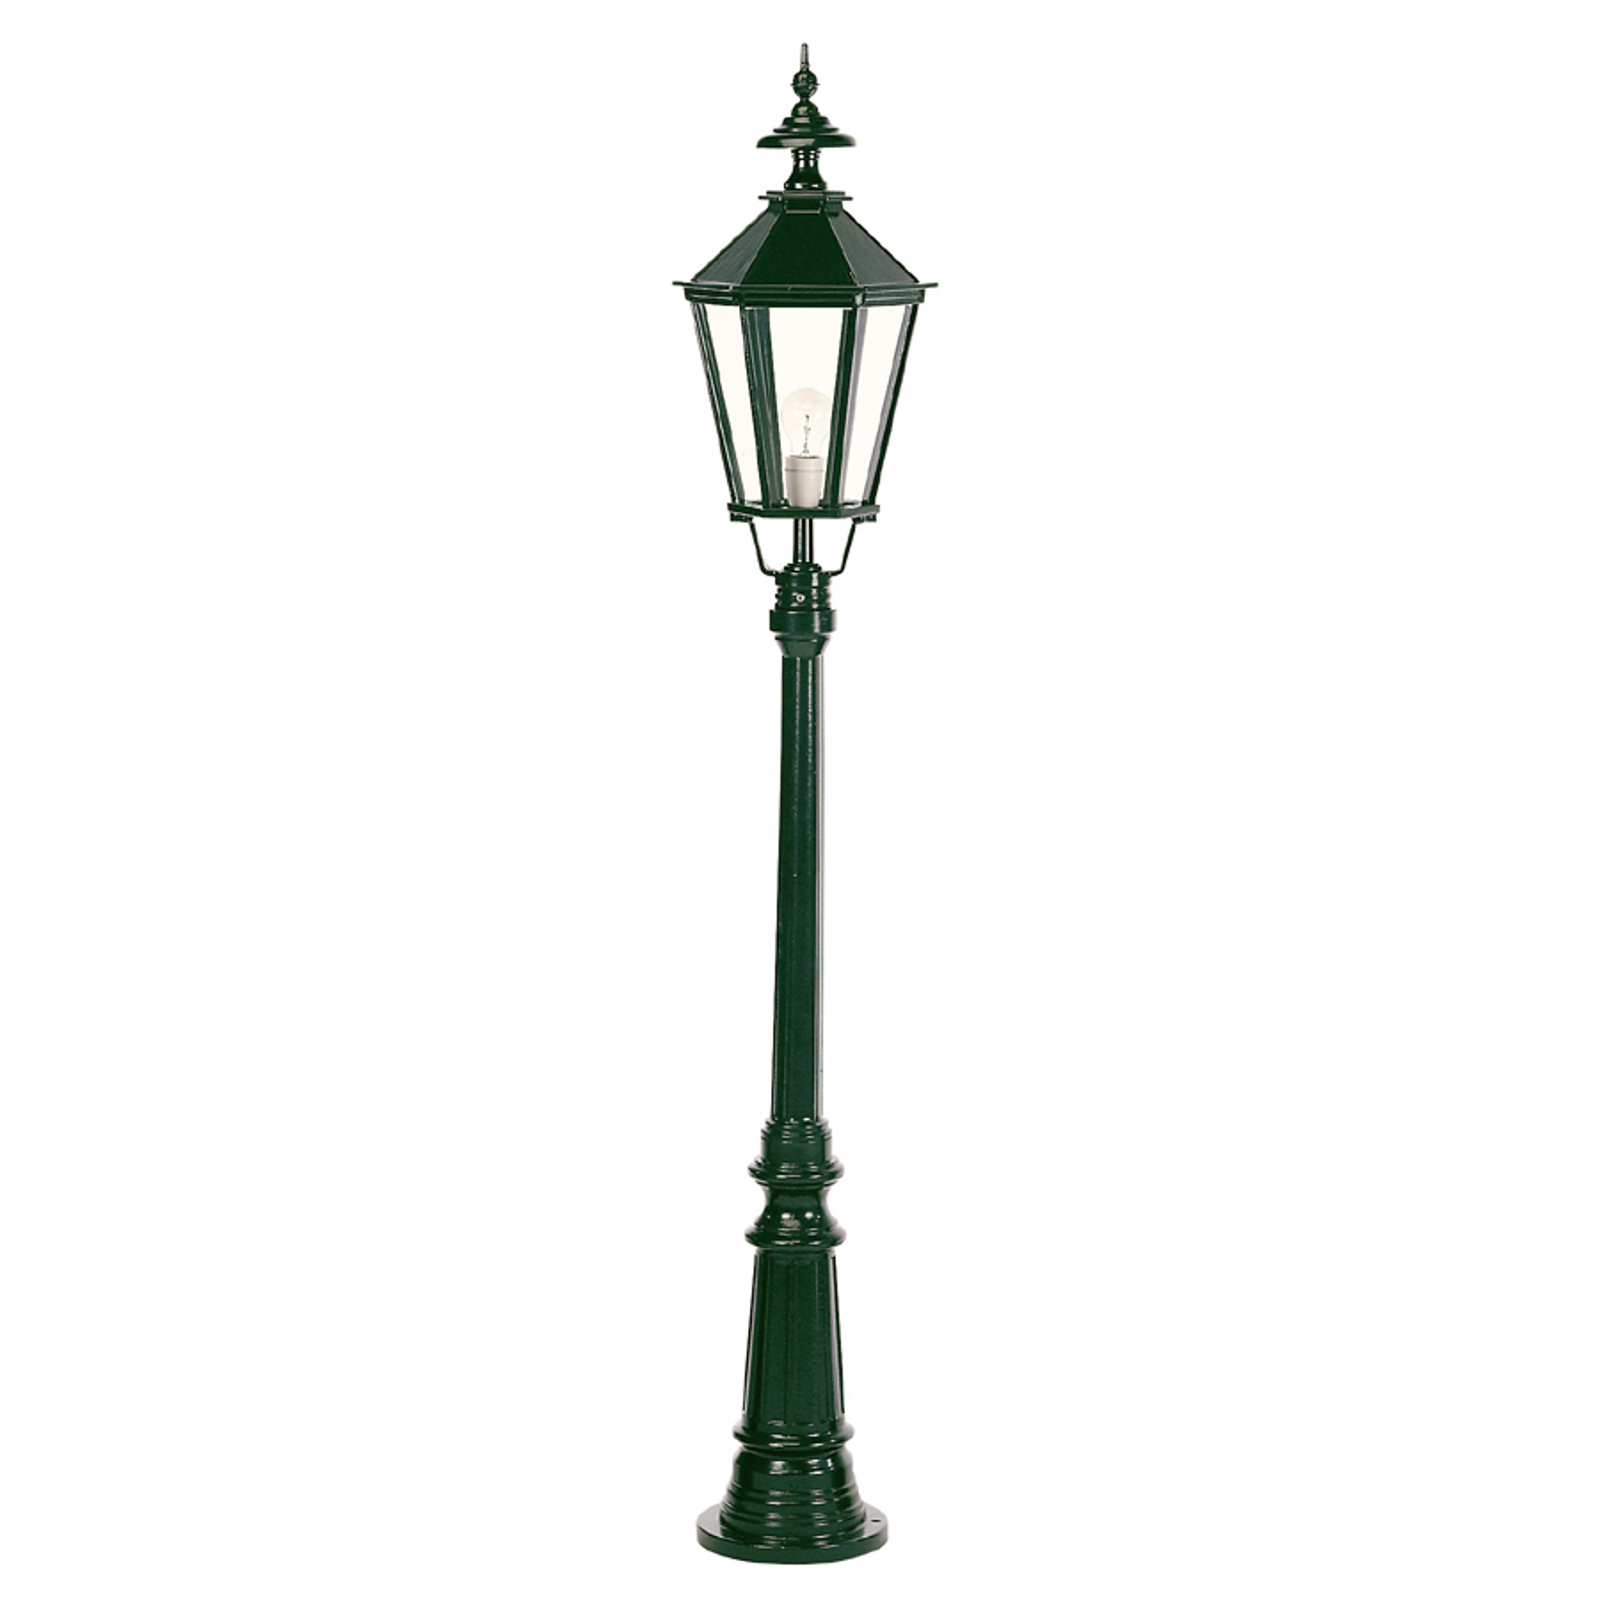 Piękna latarnia Dublin 1-punktowa zielona